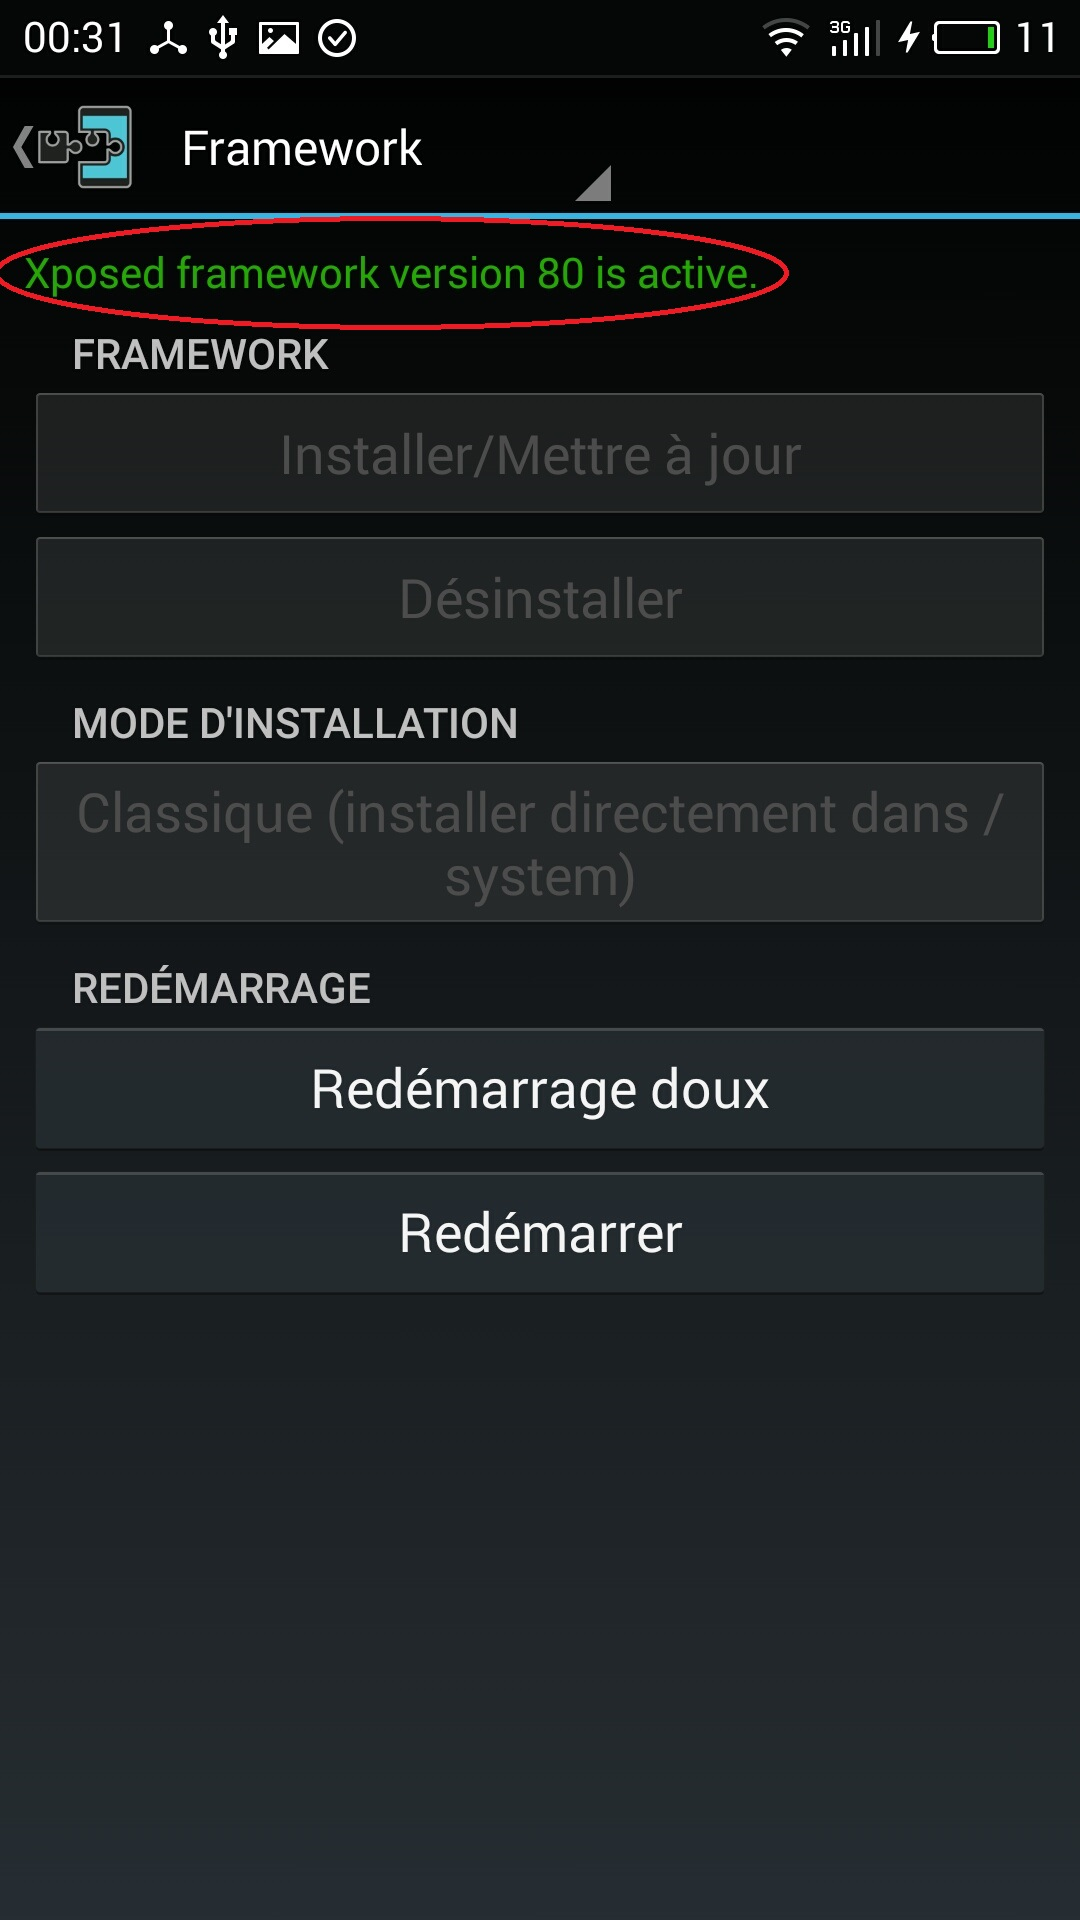 xposed installer télécharger xda